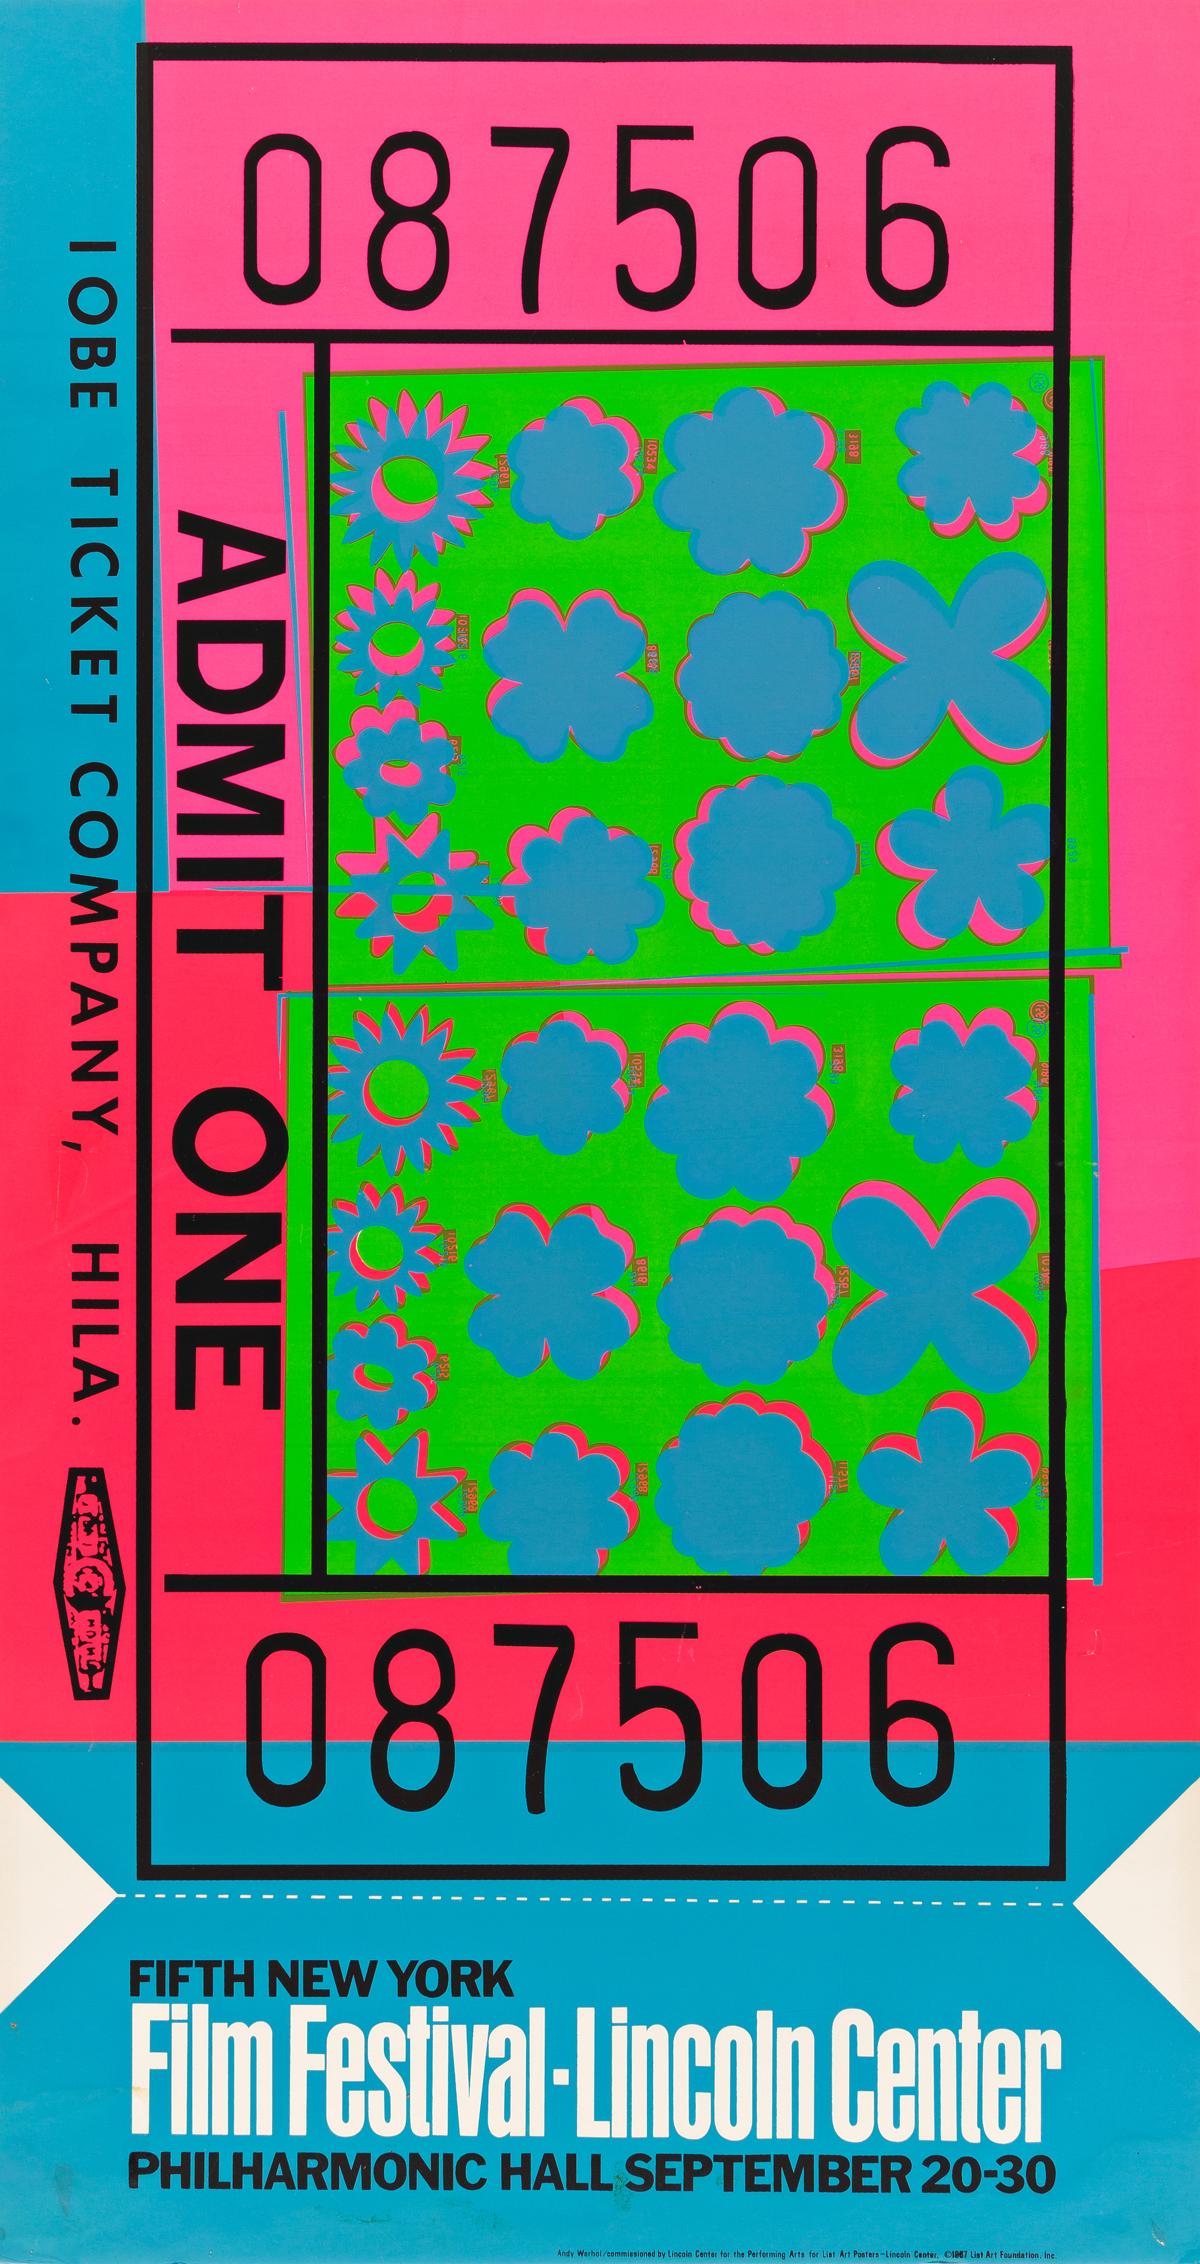 ANDY WARHOL (1928-1987).  FILM FESTIVAL - LINCOLN CENTER. 1967. 45x24 inches, 114¼x61 cm. List Art Foundation, Inc., [New York.]